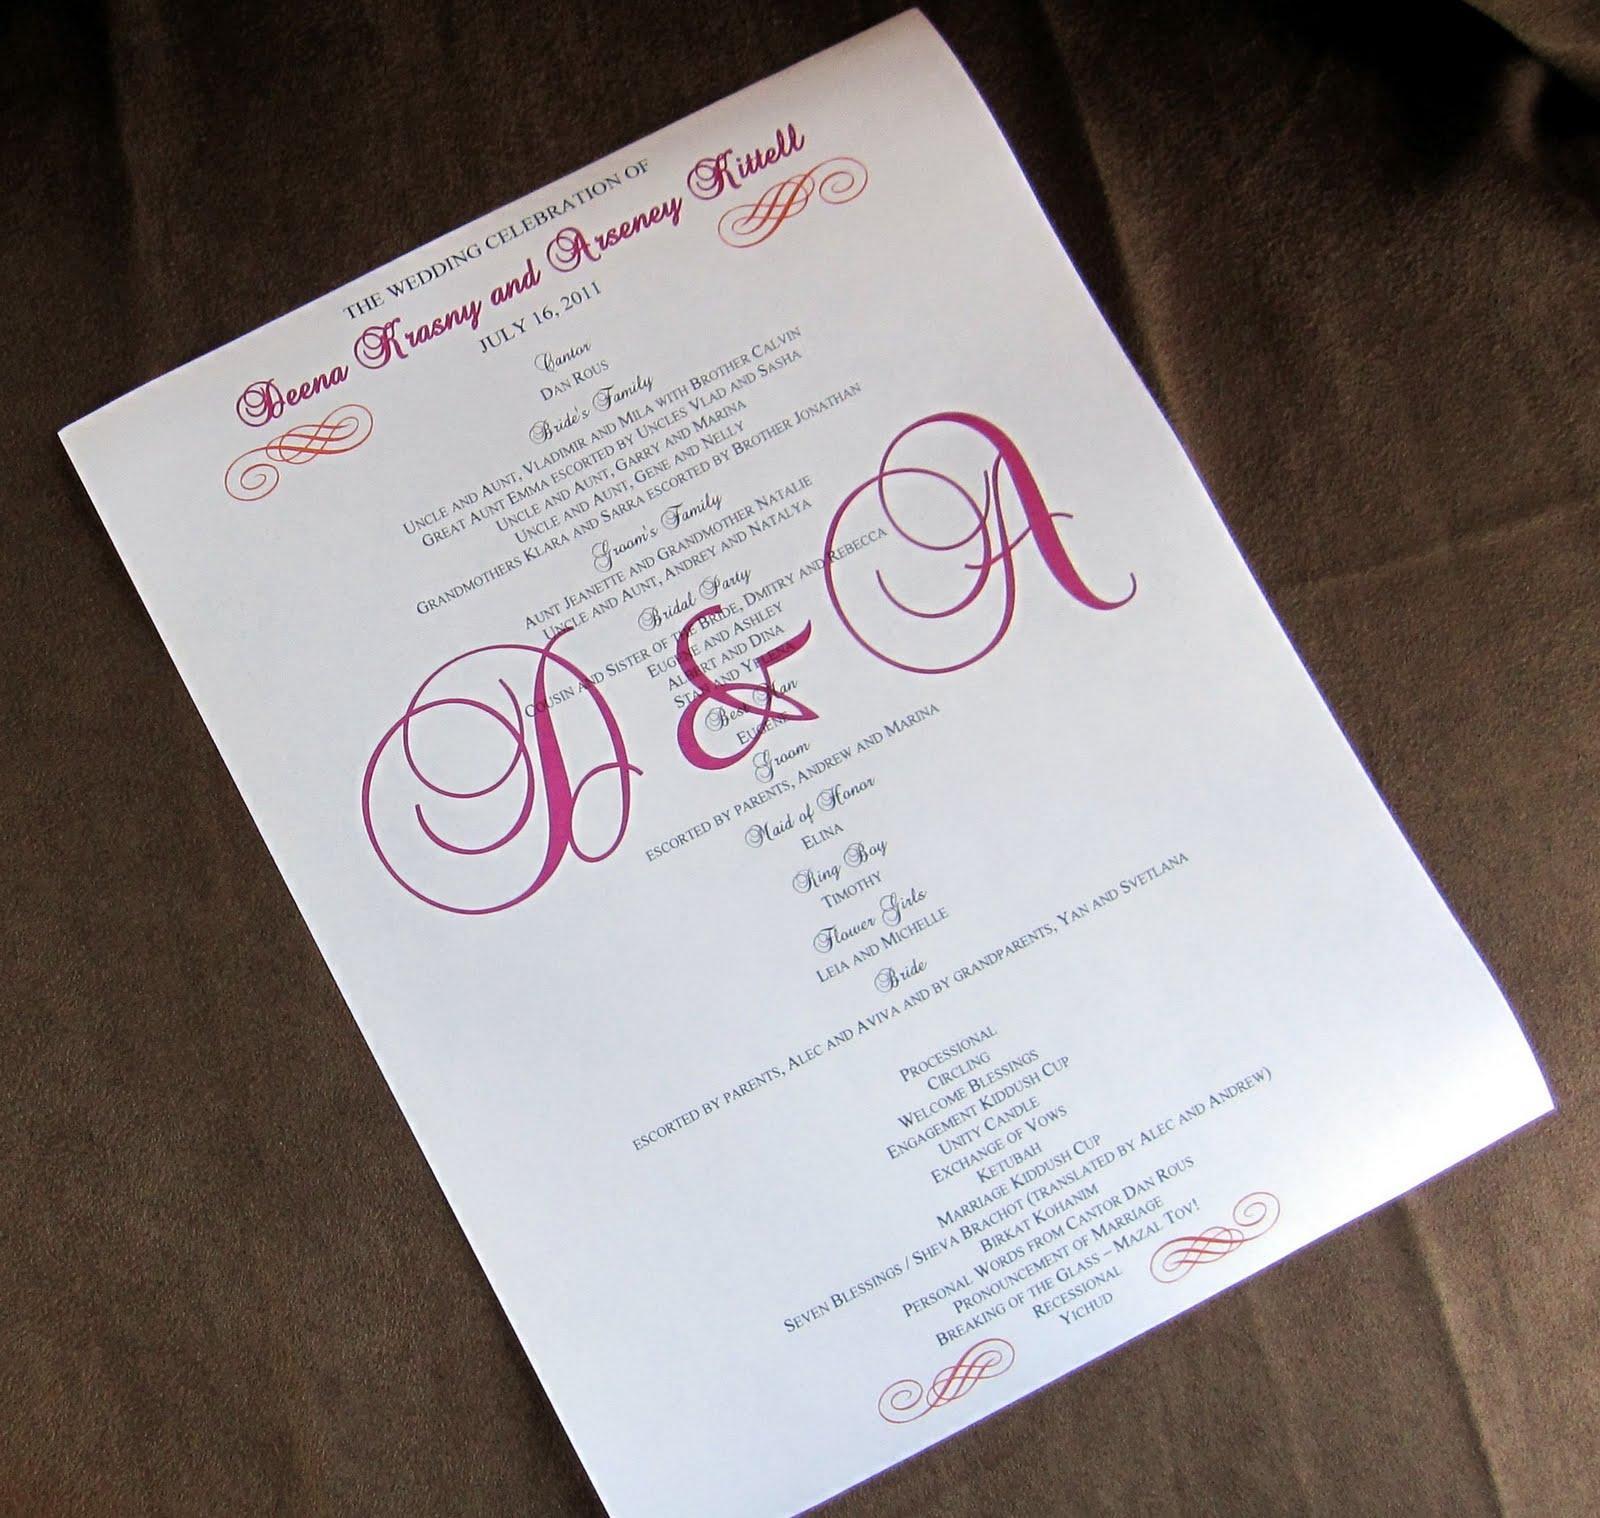 scrapping innovations  brittney  u0026 aaron and deena  u0026 arseney scroll wedding programs